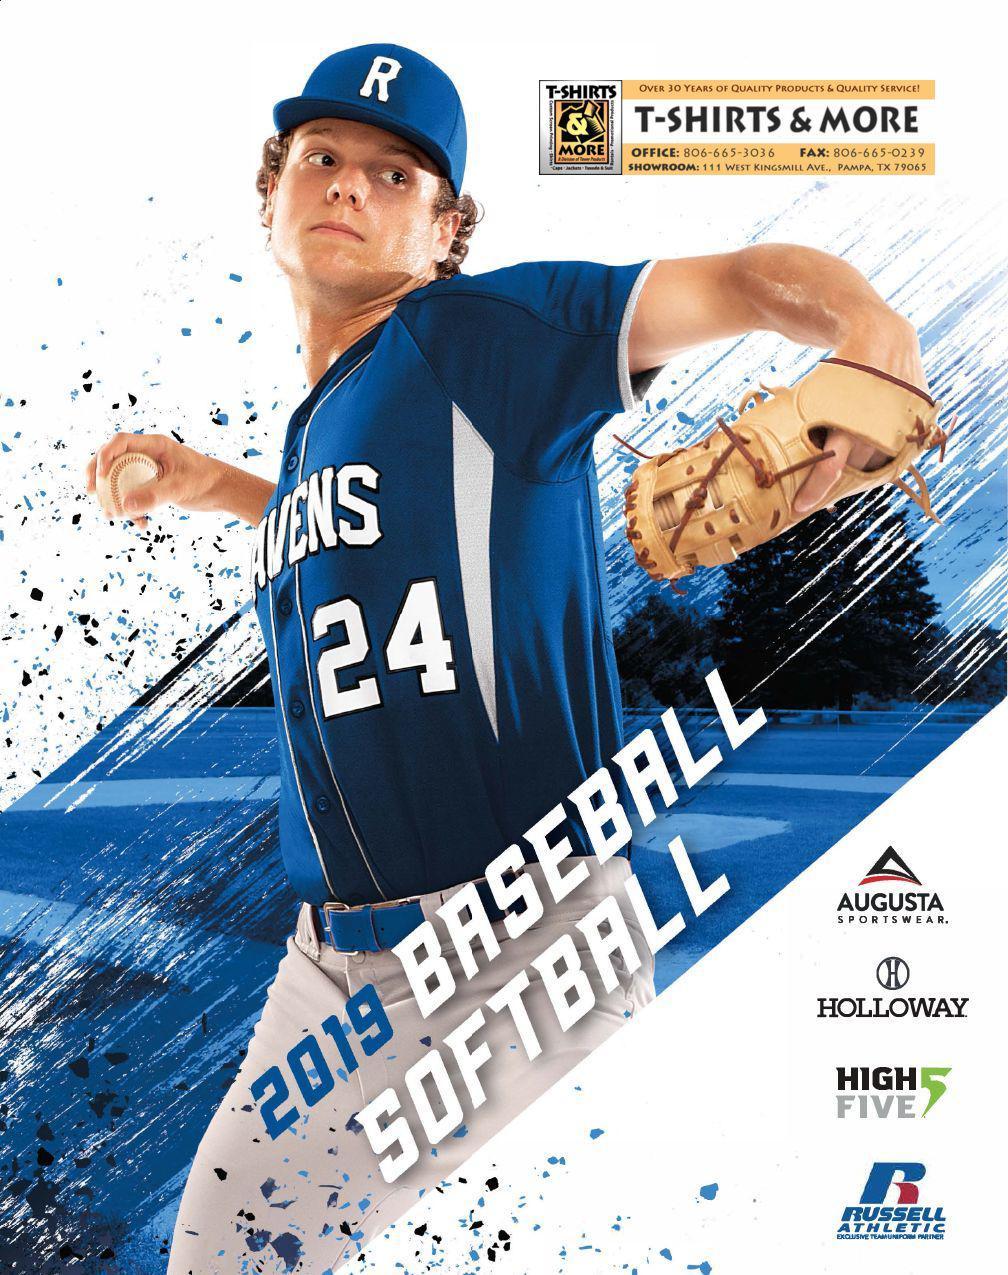 2019_Augusta_Baseball-Softball